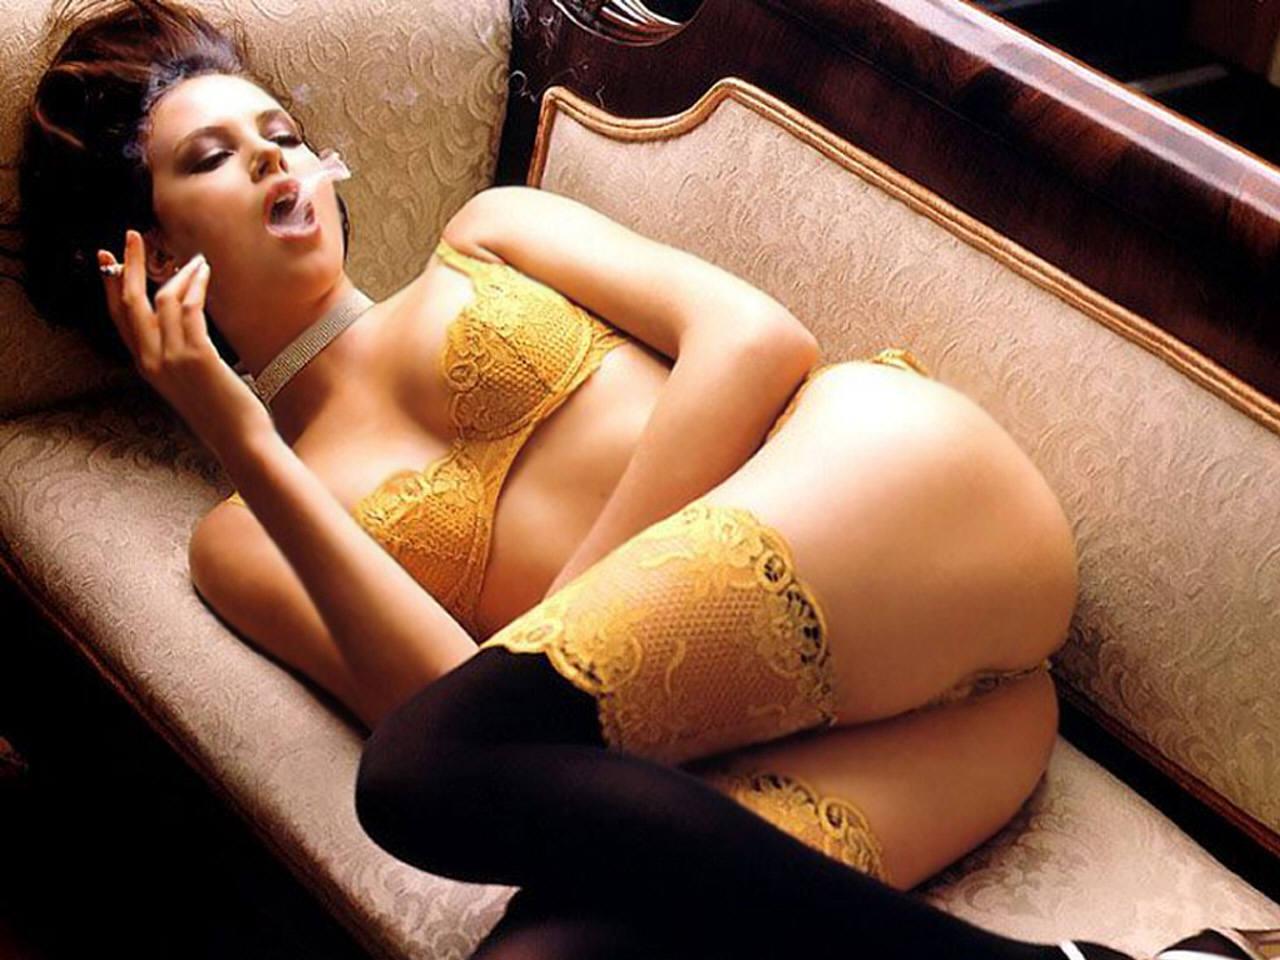 http://3.bp.blogspot.com/--7kBGo2DeyI/T5f5mDpc1nI/AAAAAAAAEWM/jfVP1DeJvOU/s1600/Charlize+Theron+Hot-4.jpg